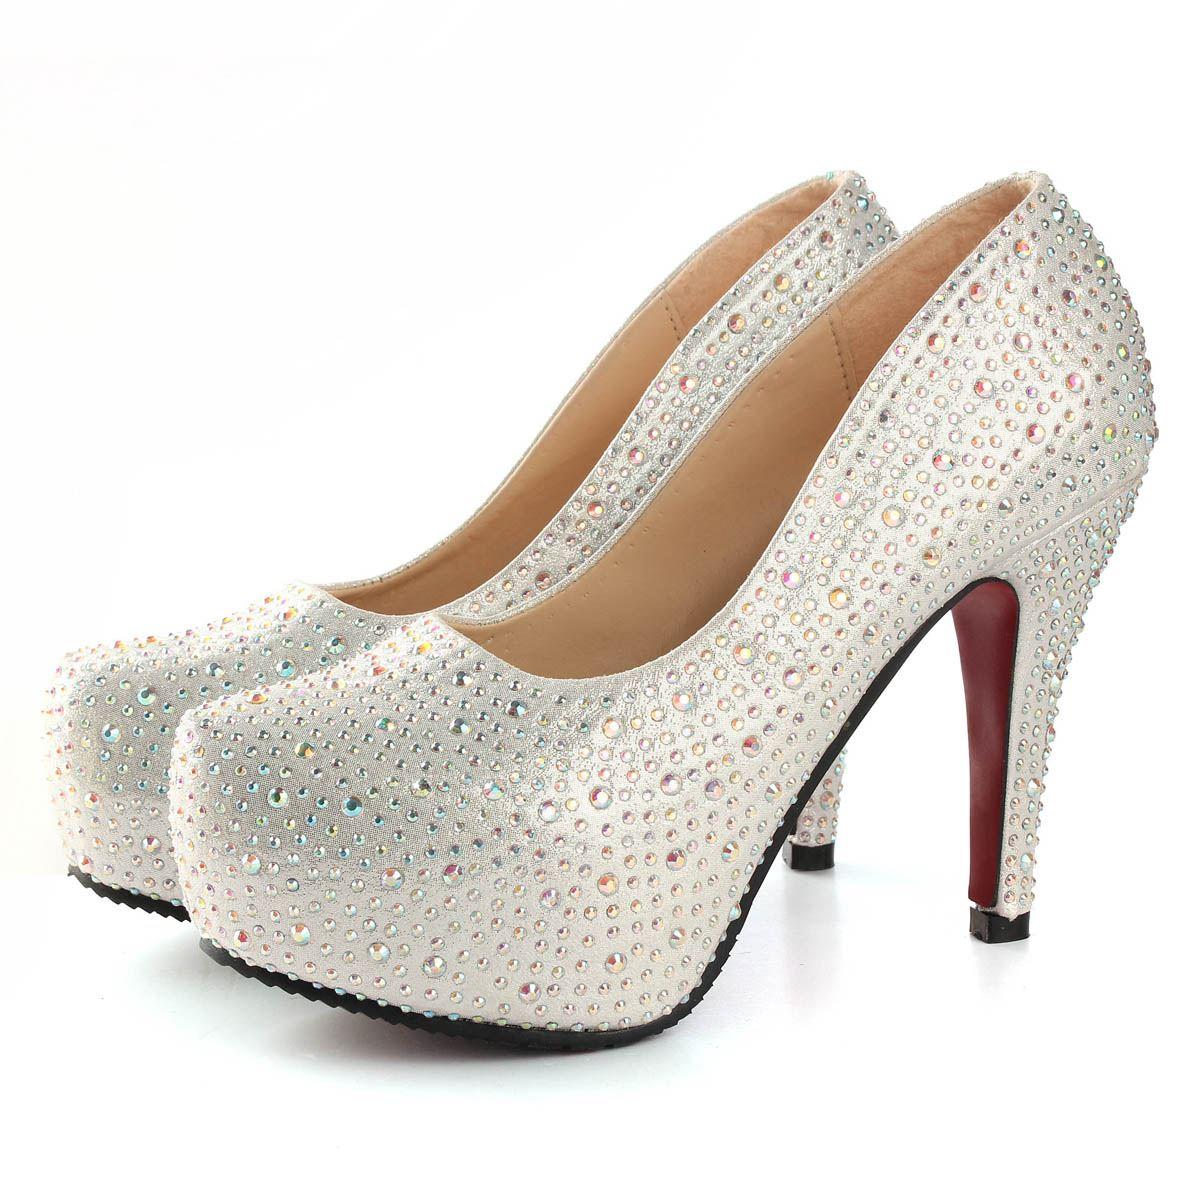 Cheap Silver Heels With Rhinestones - Is Heel